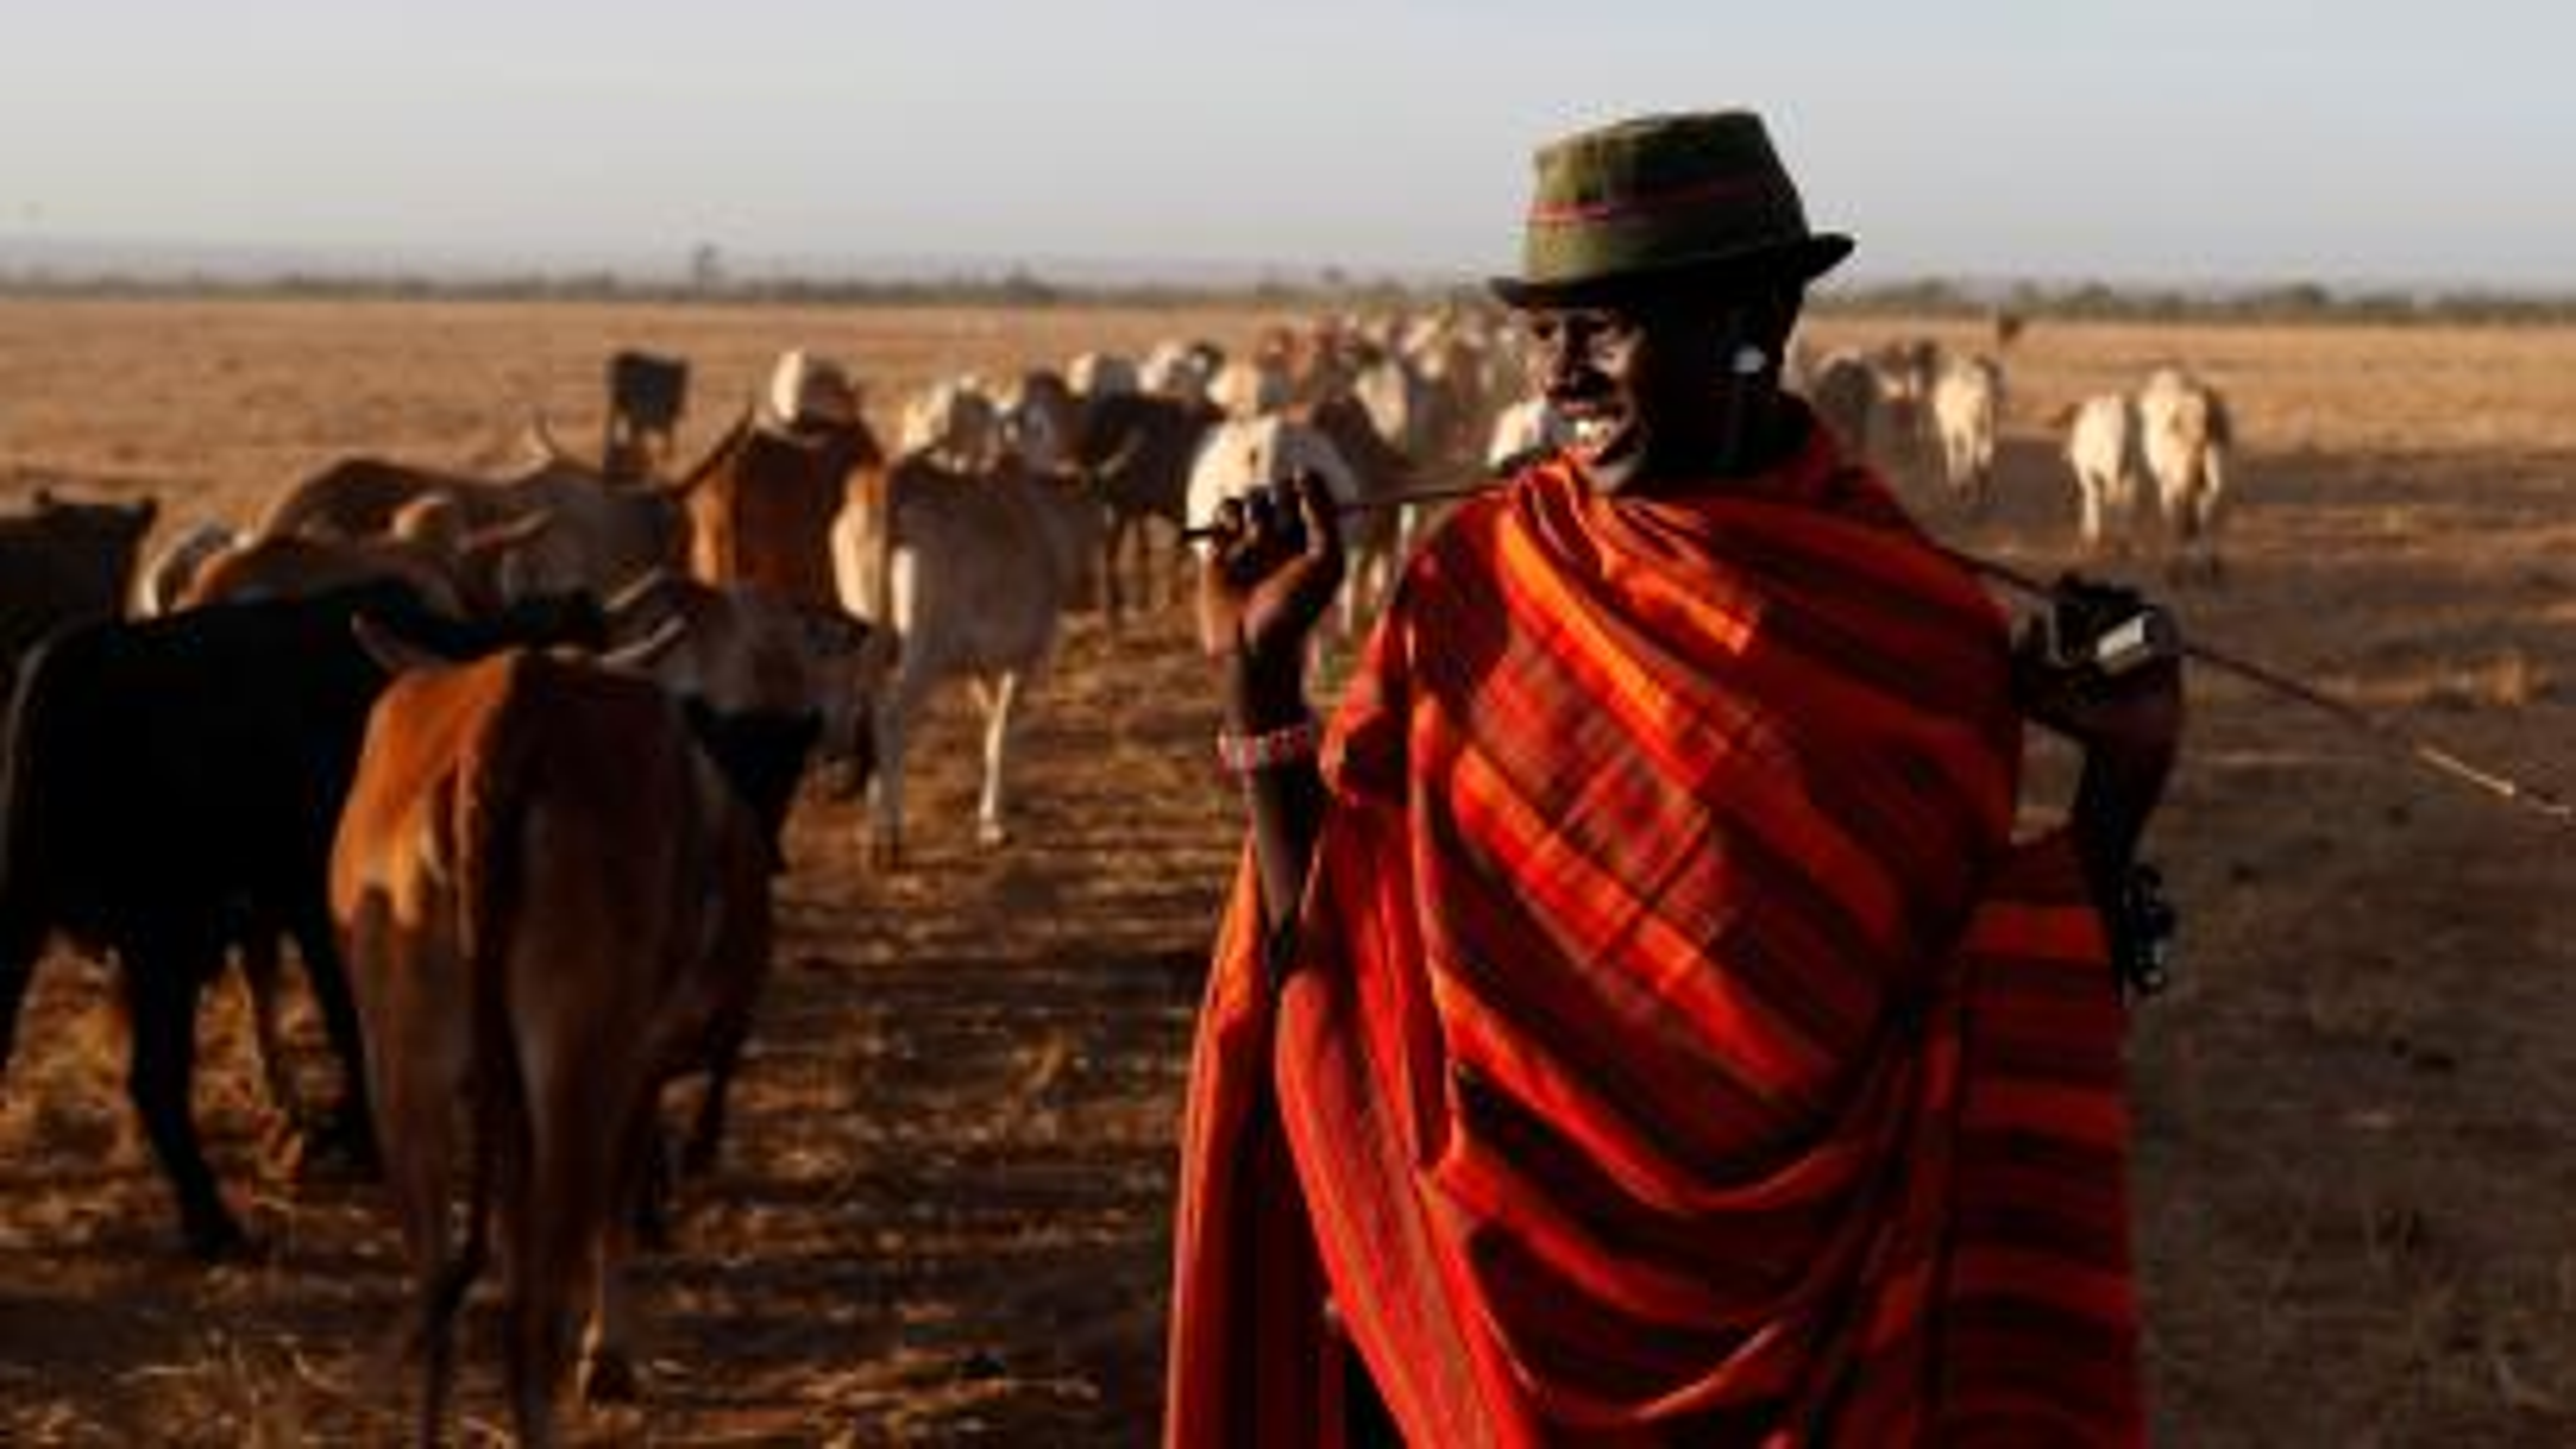 A Samburu tribesman stands behind cows as he enters the Mugui conservancy, Kenya February 11, 2017.